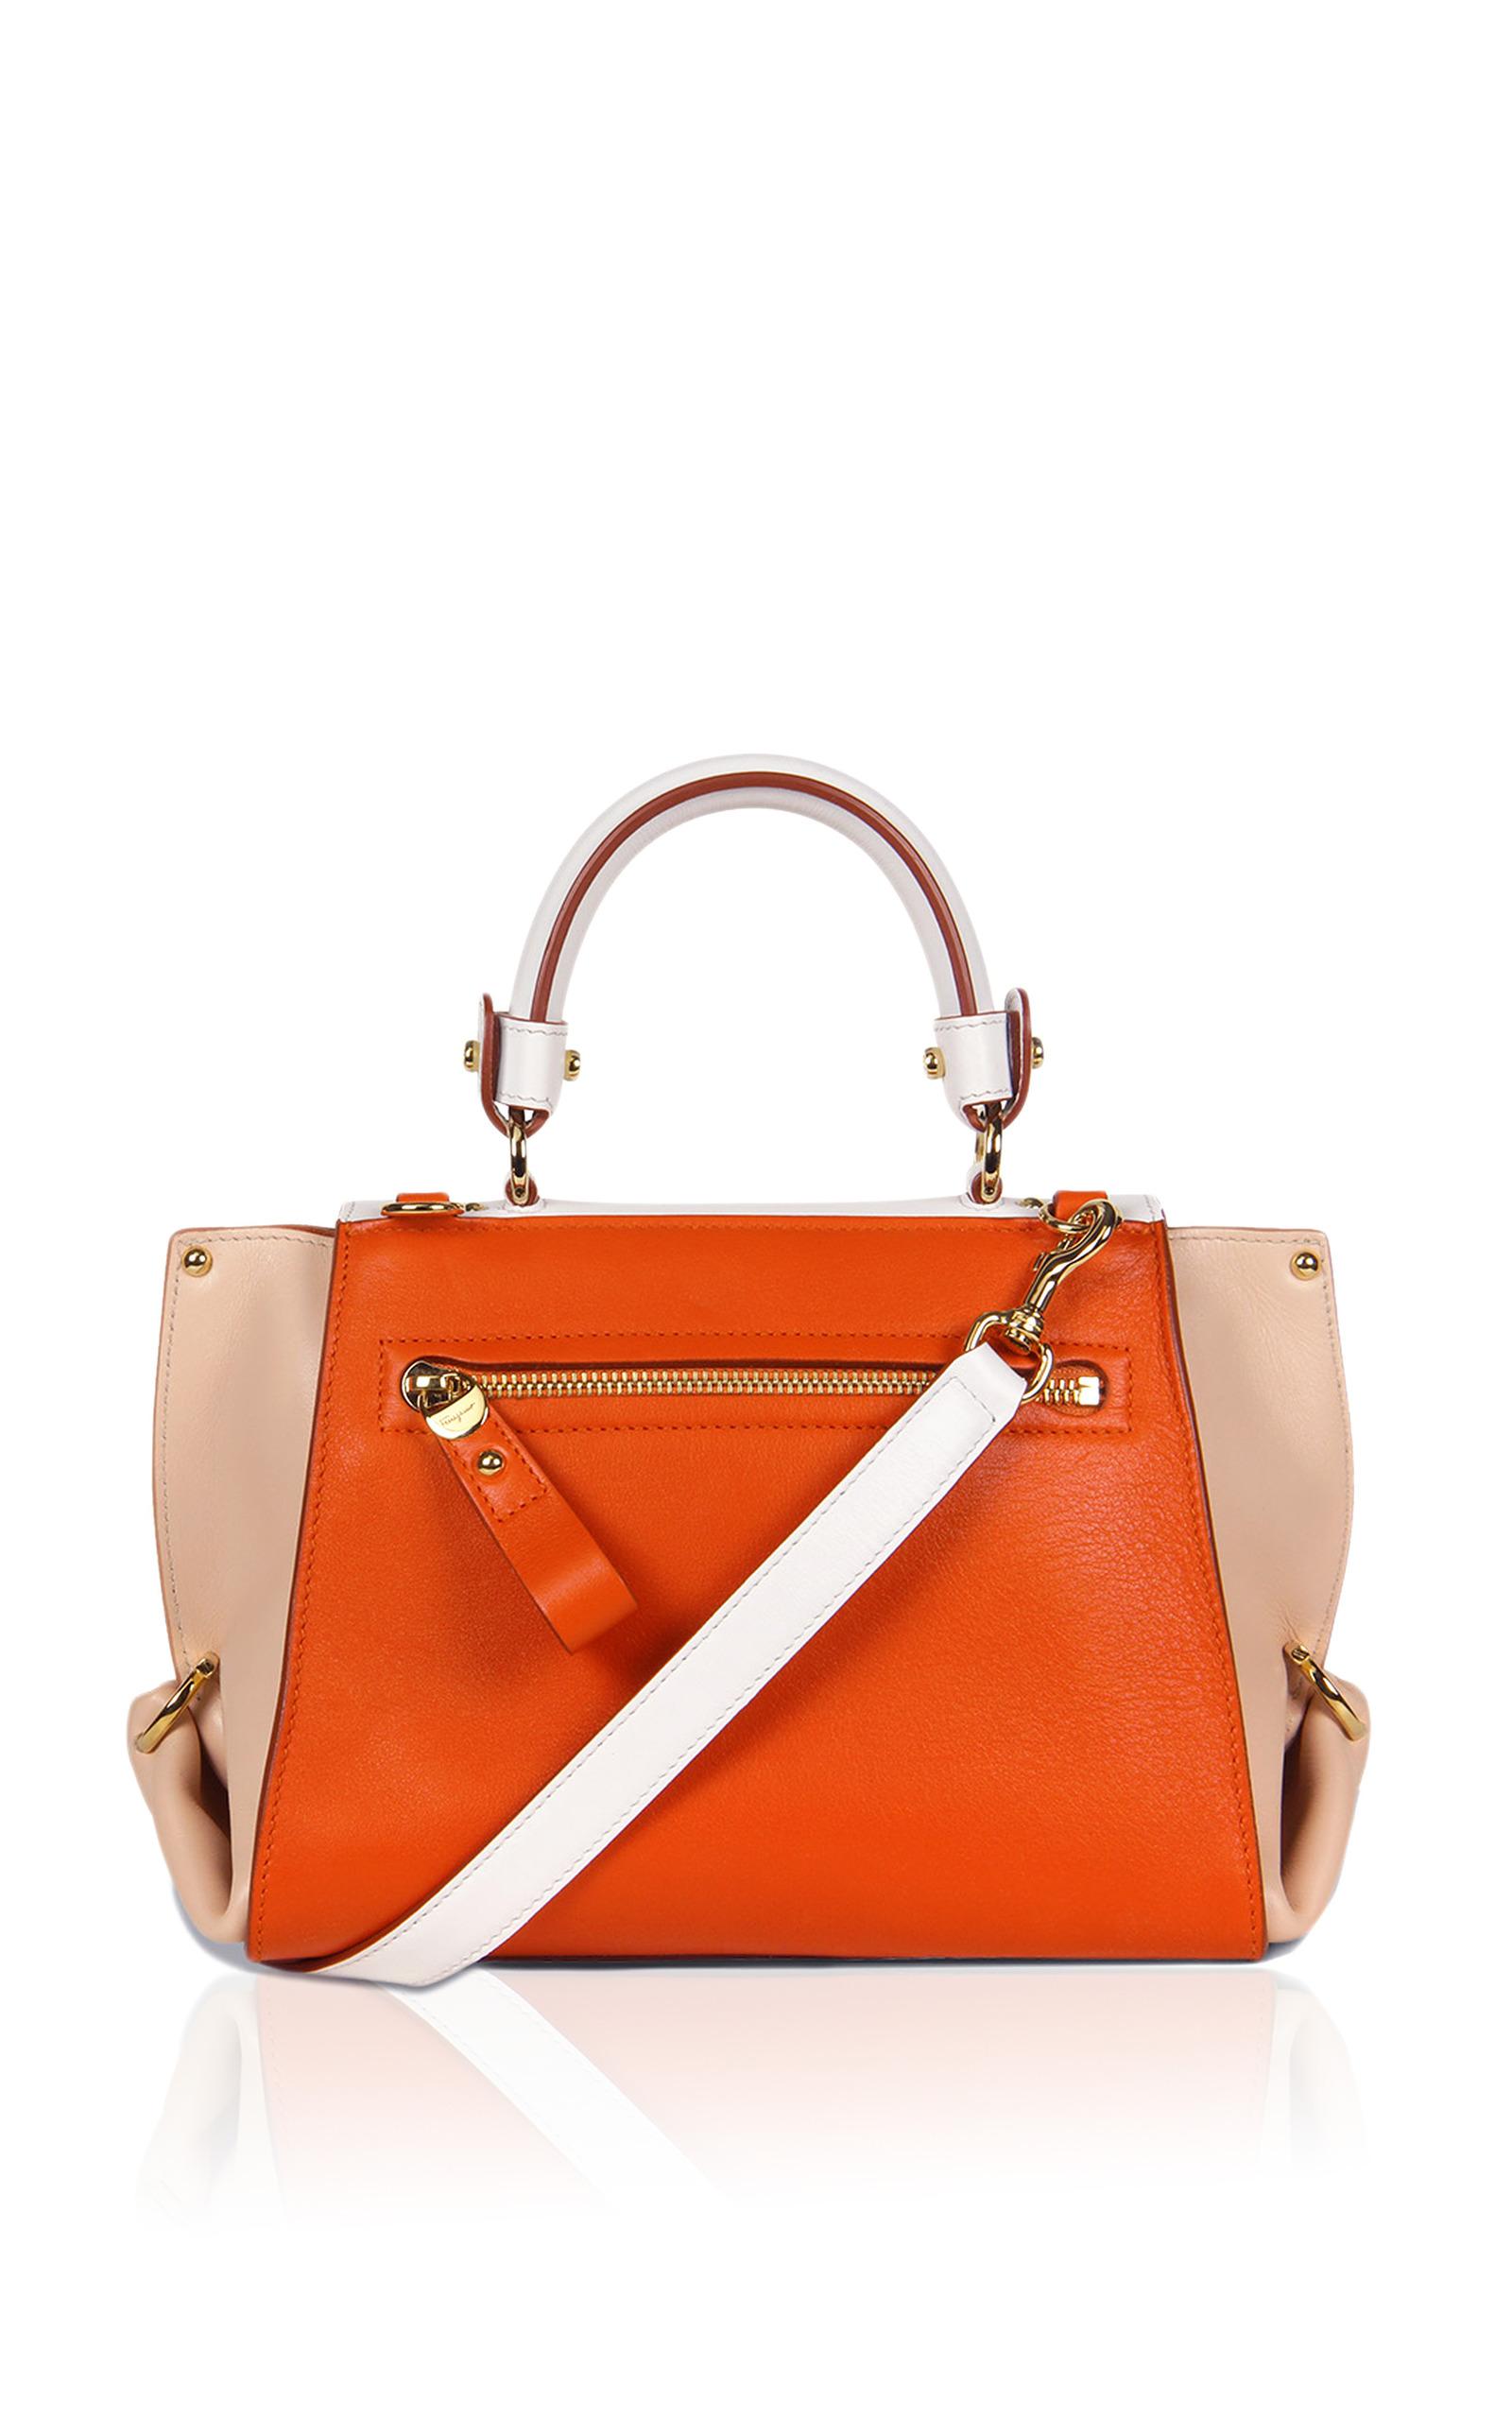 9e4087e594 Salvatore FerragamoSmall Sofia In Deep Orange. CLOSE. Loading. Loading